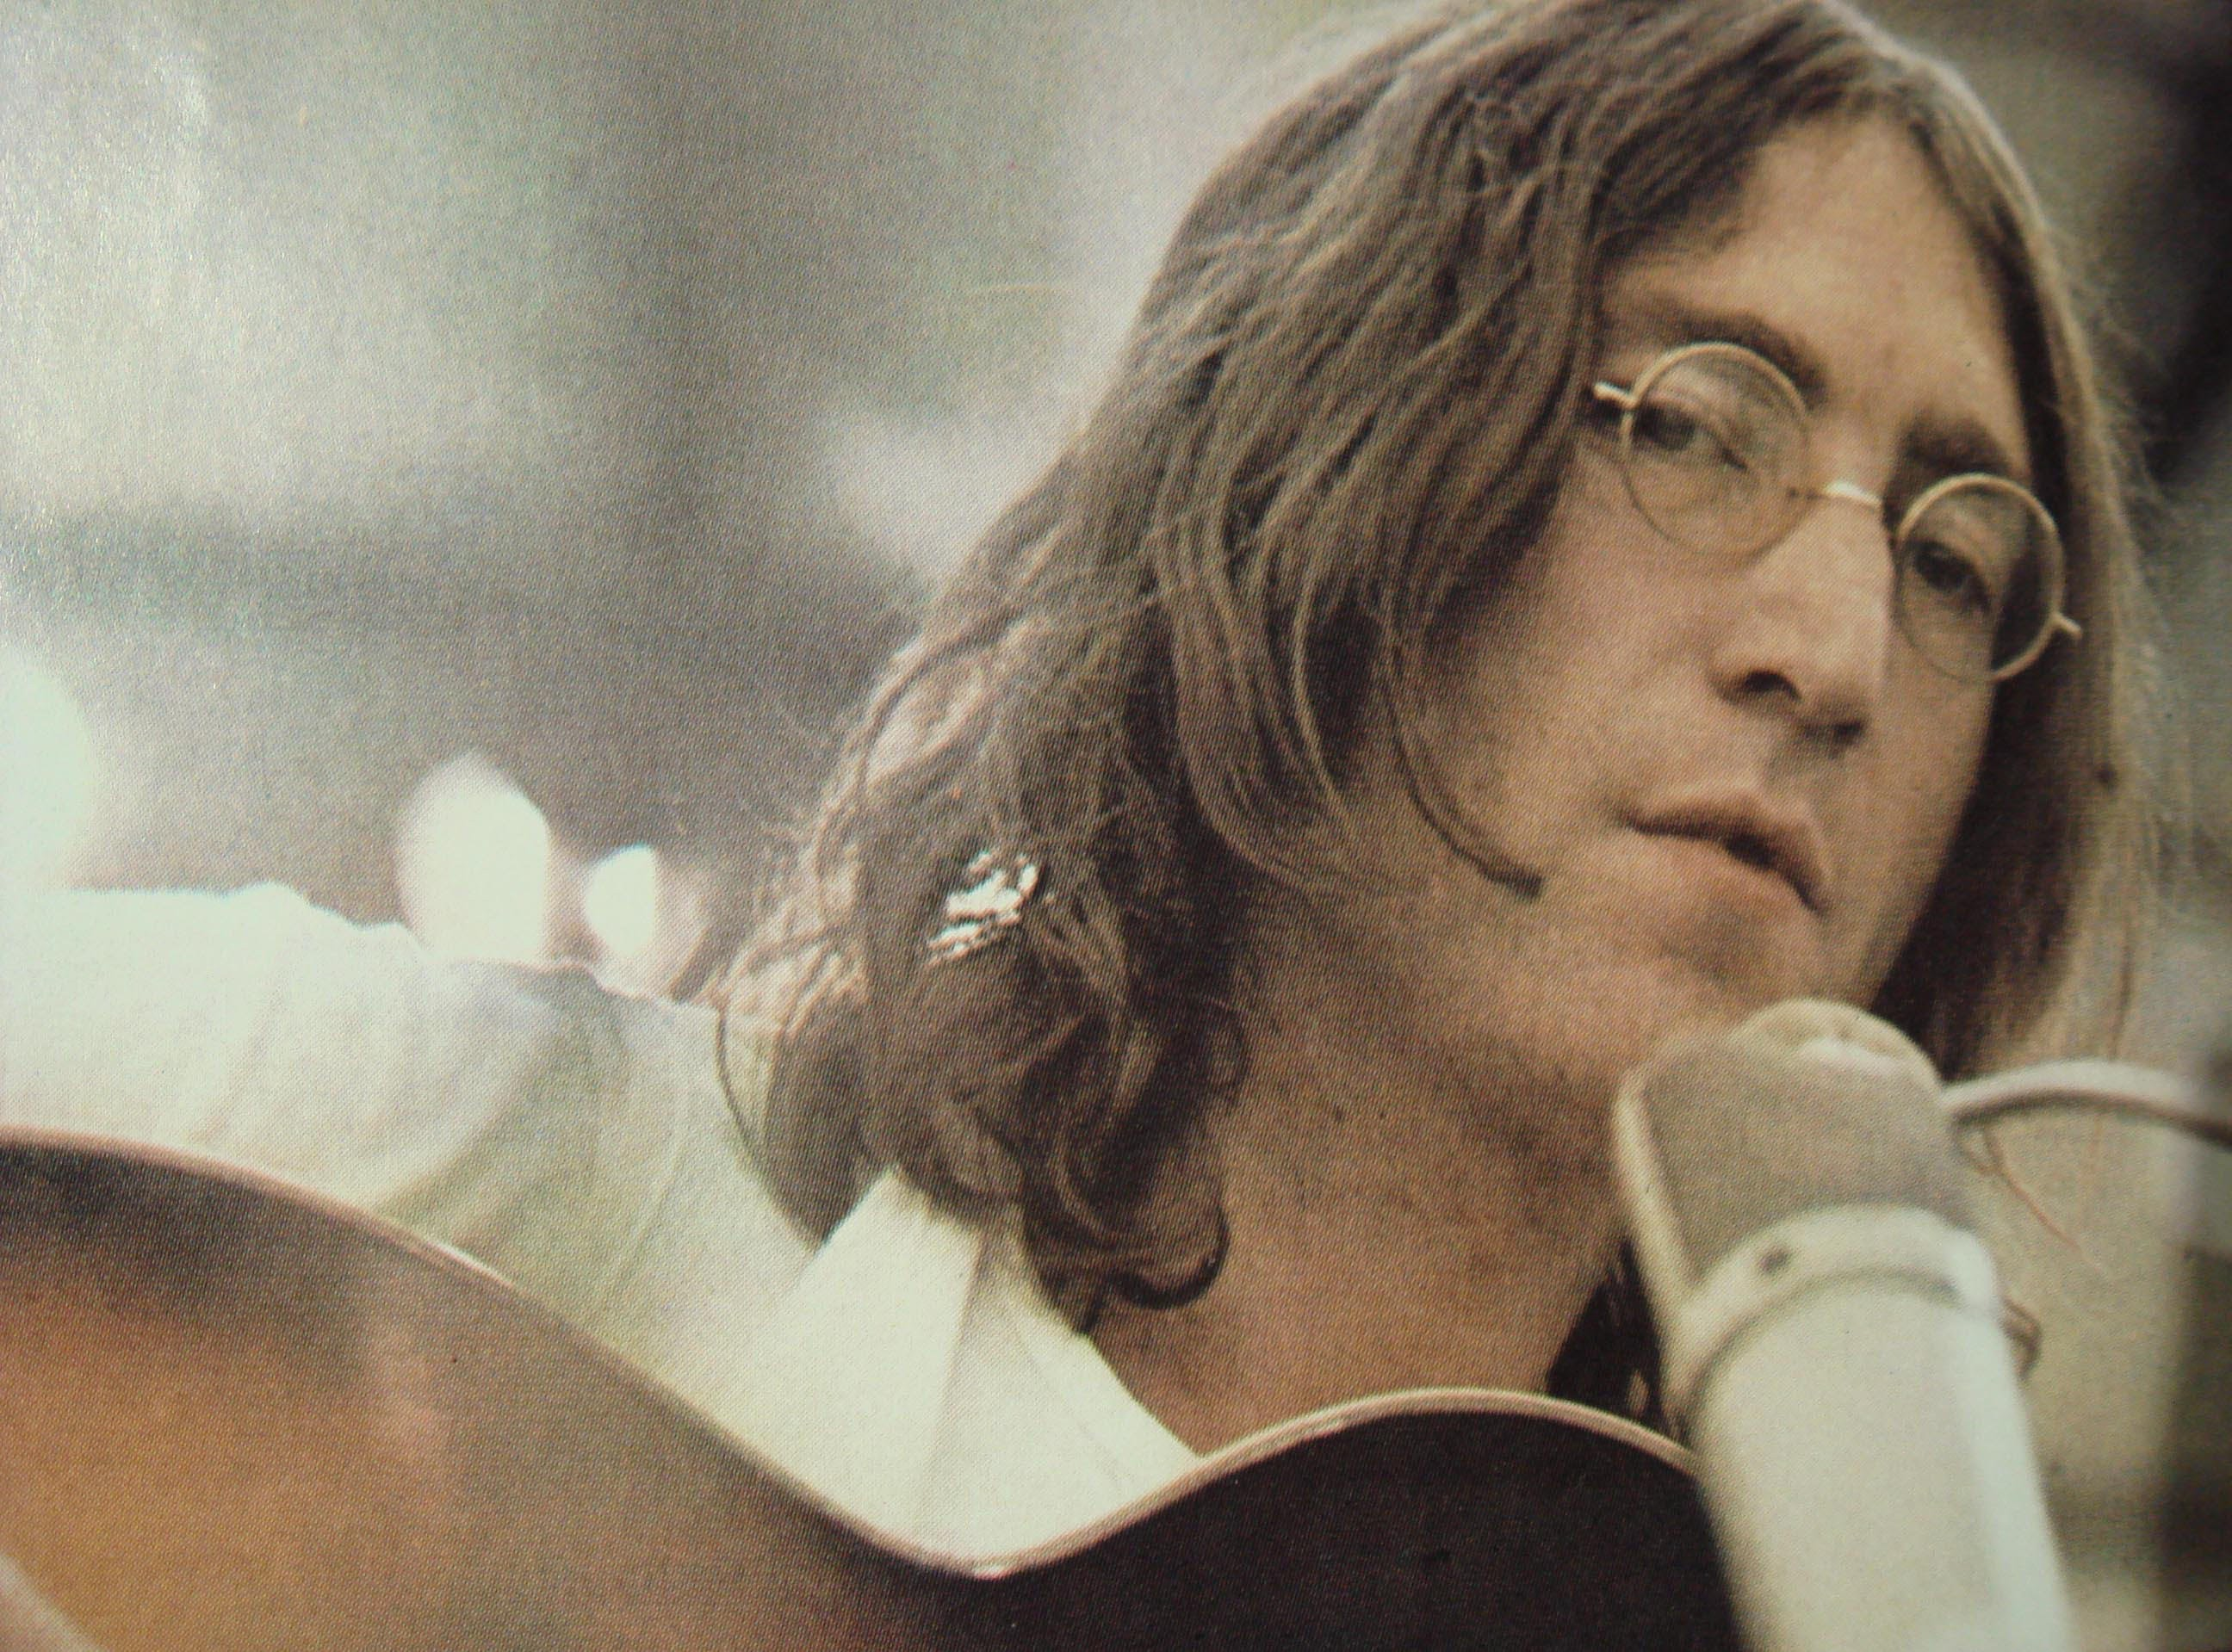 John Lennon Hd Background